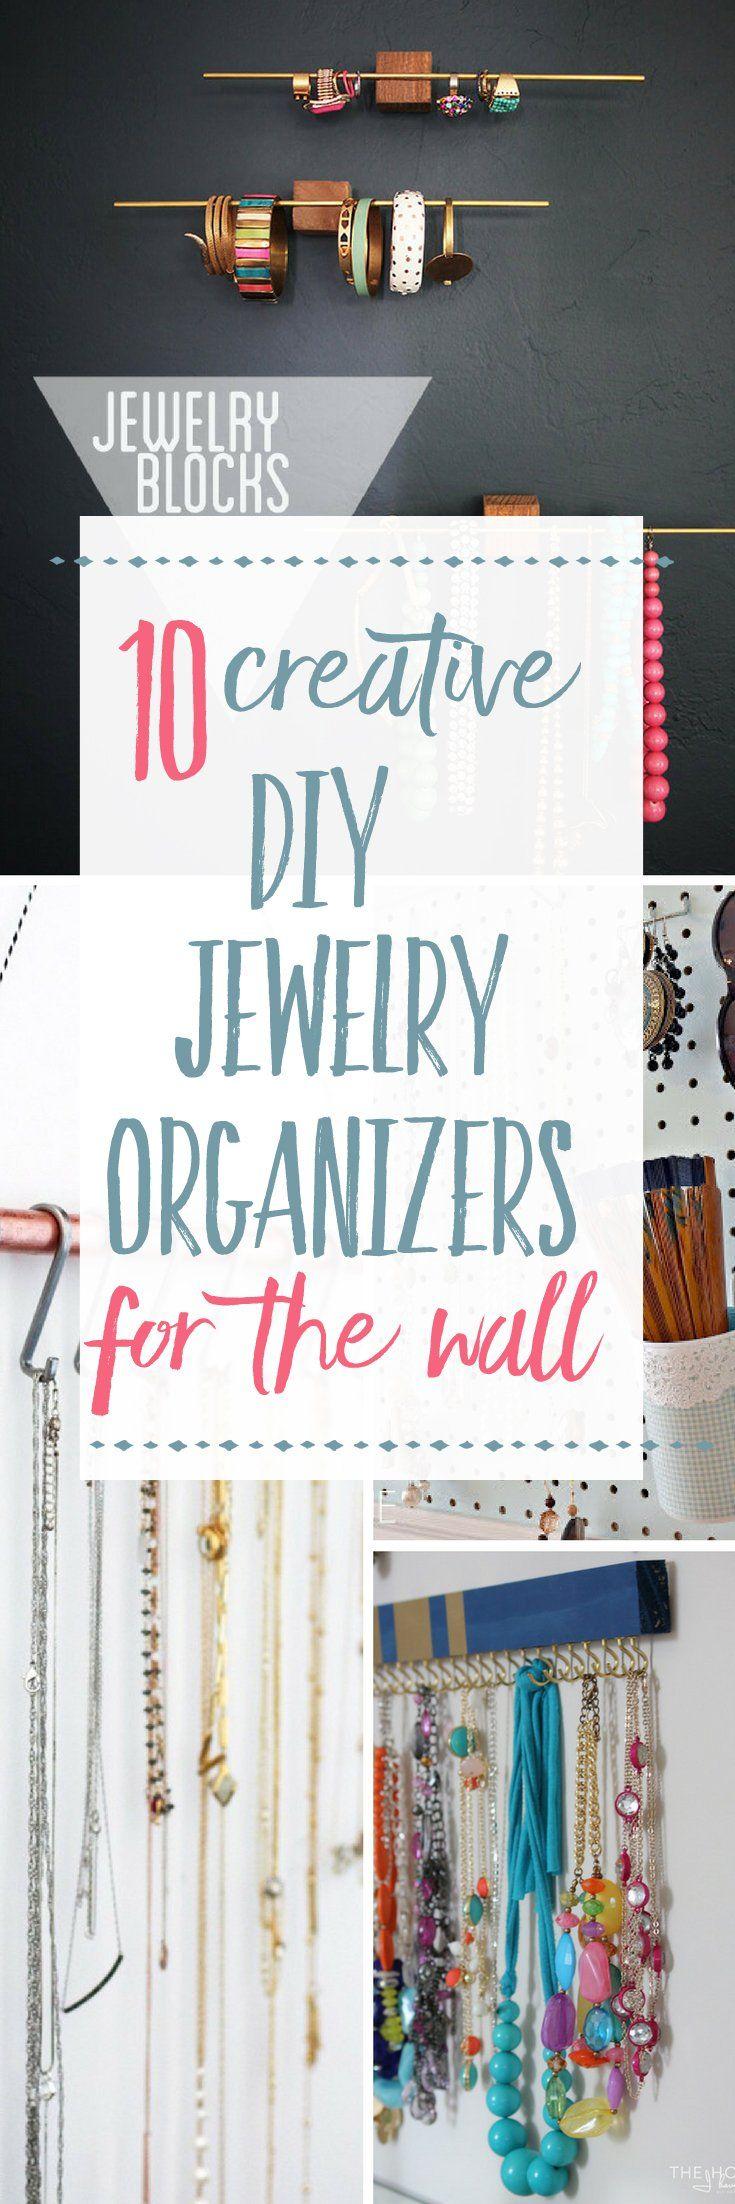 10 Creative DIY Jewelry Organizers Harbour